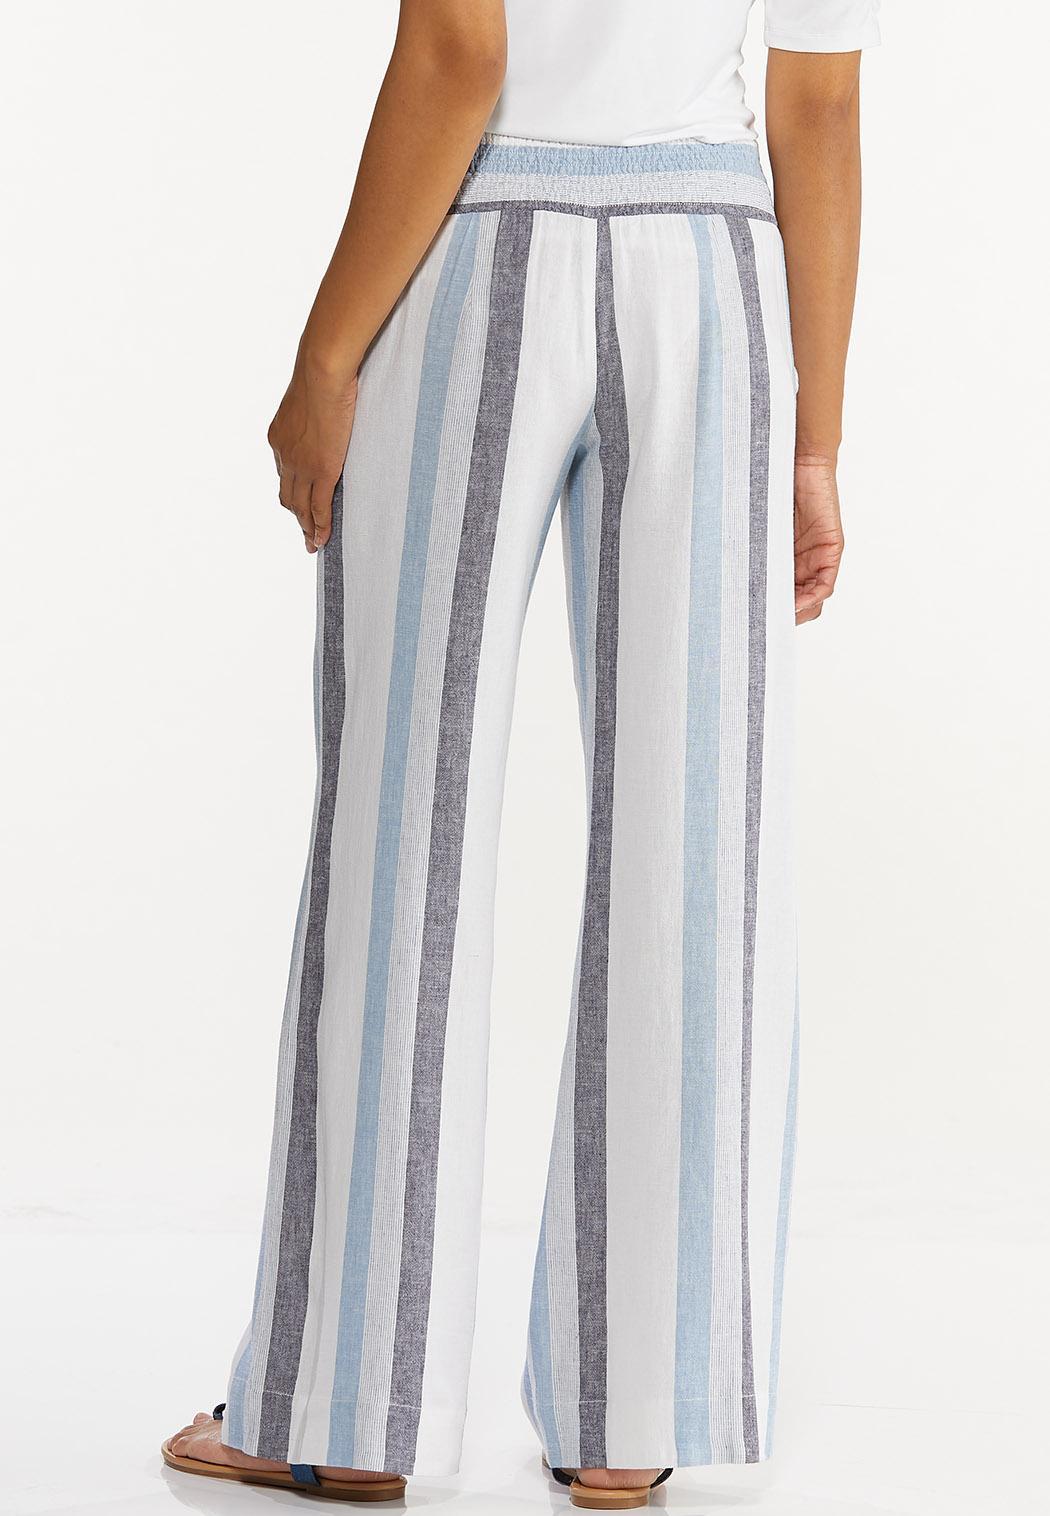 Striped Linen Palazzo Pants (Item #44589622)